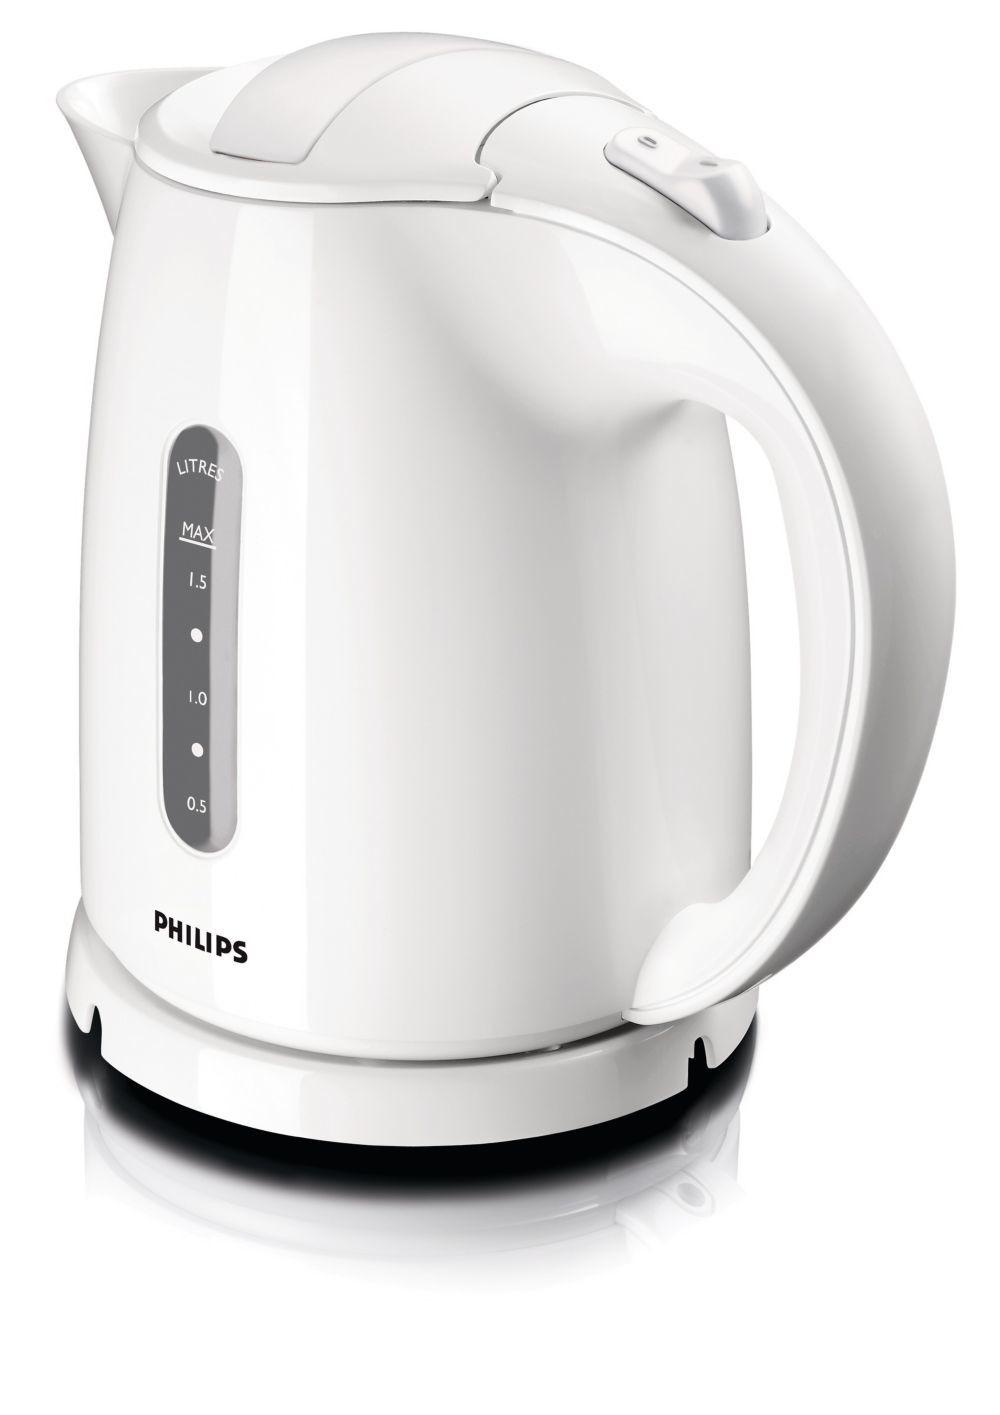 Philips Kettle HD4646/00 Standard, Plastic, White, 2400 W, 360° rotational base, 1.5 L